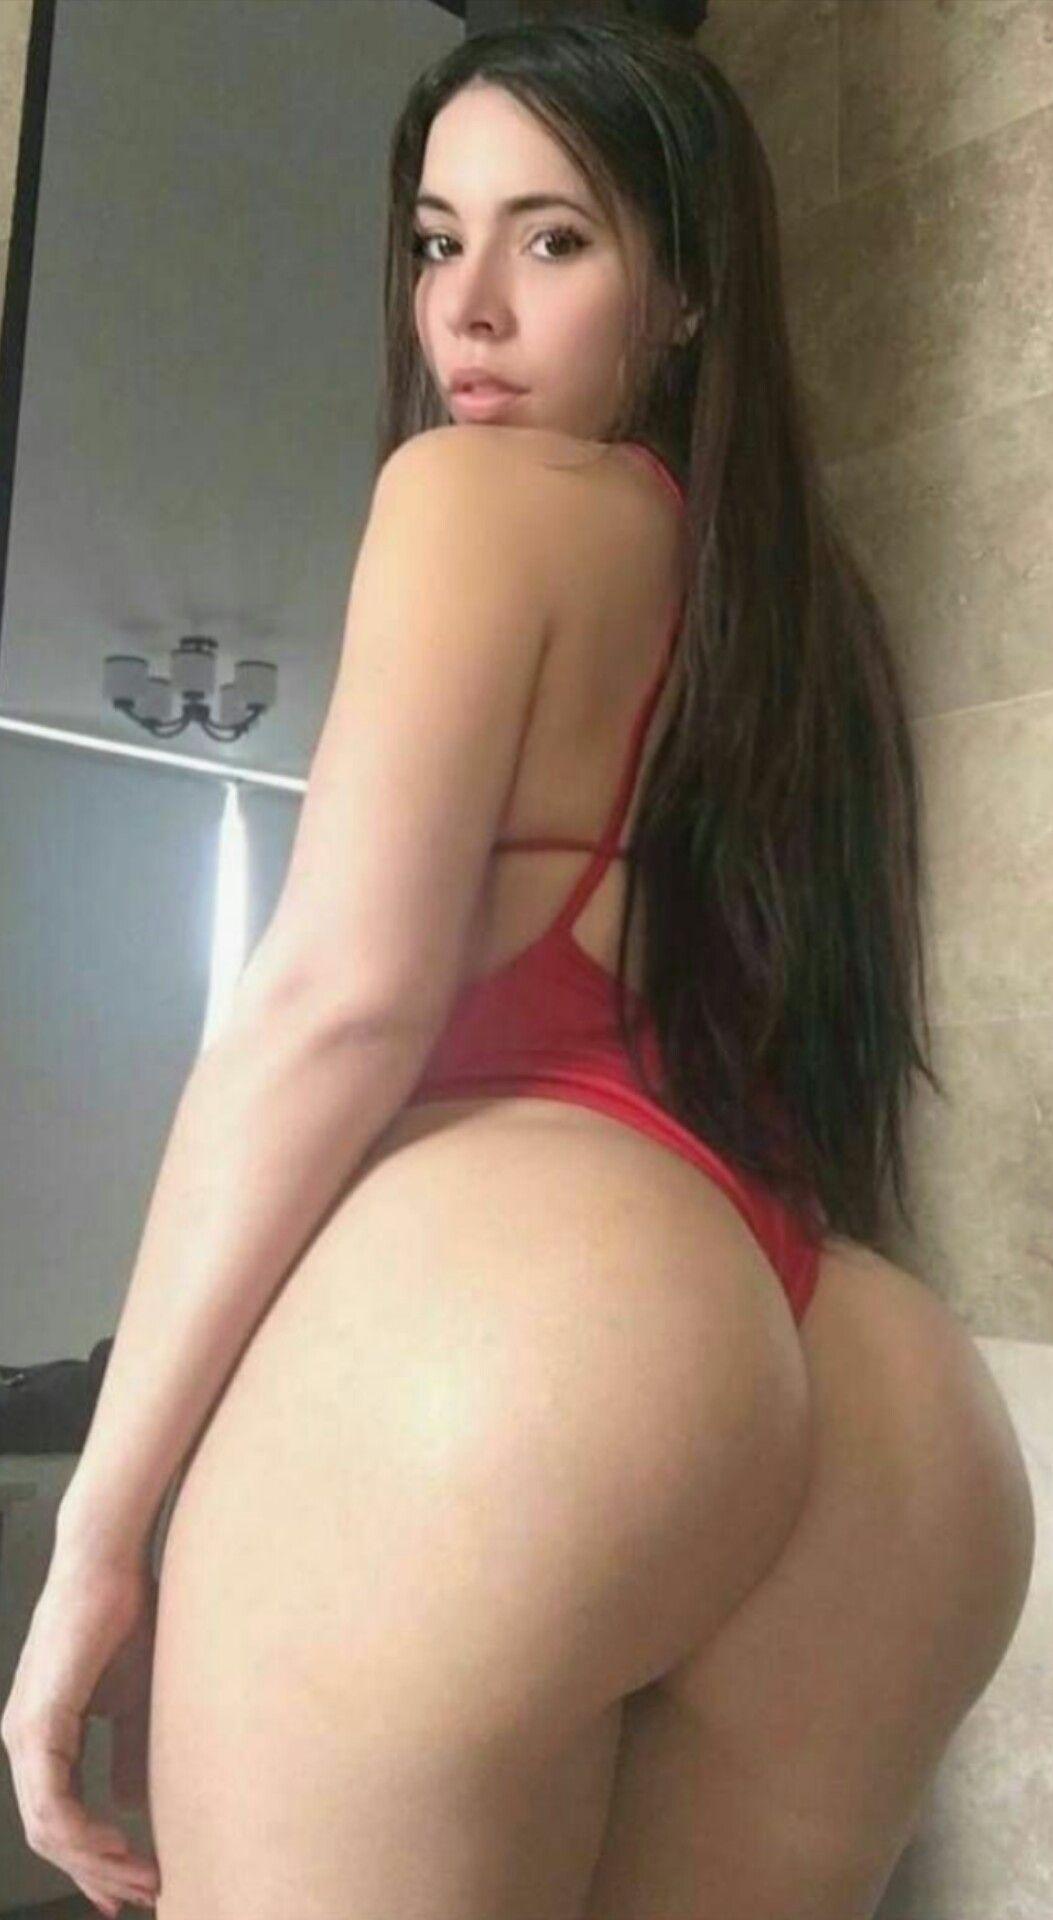 Big spanish ass pics